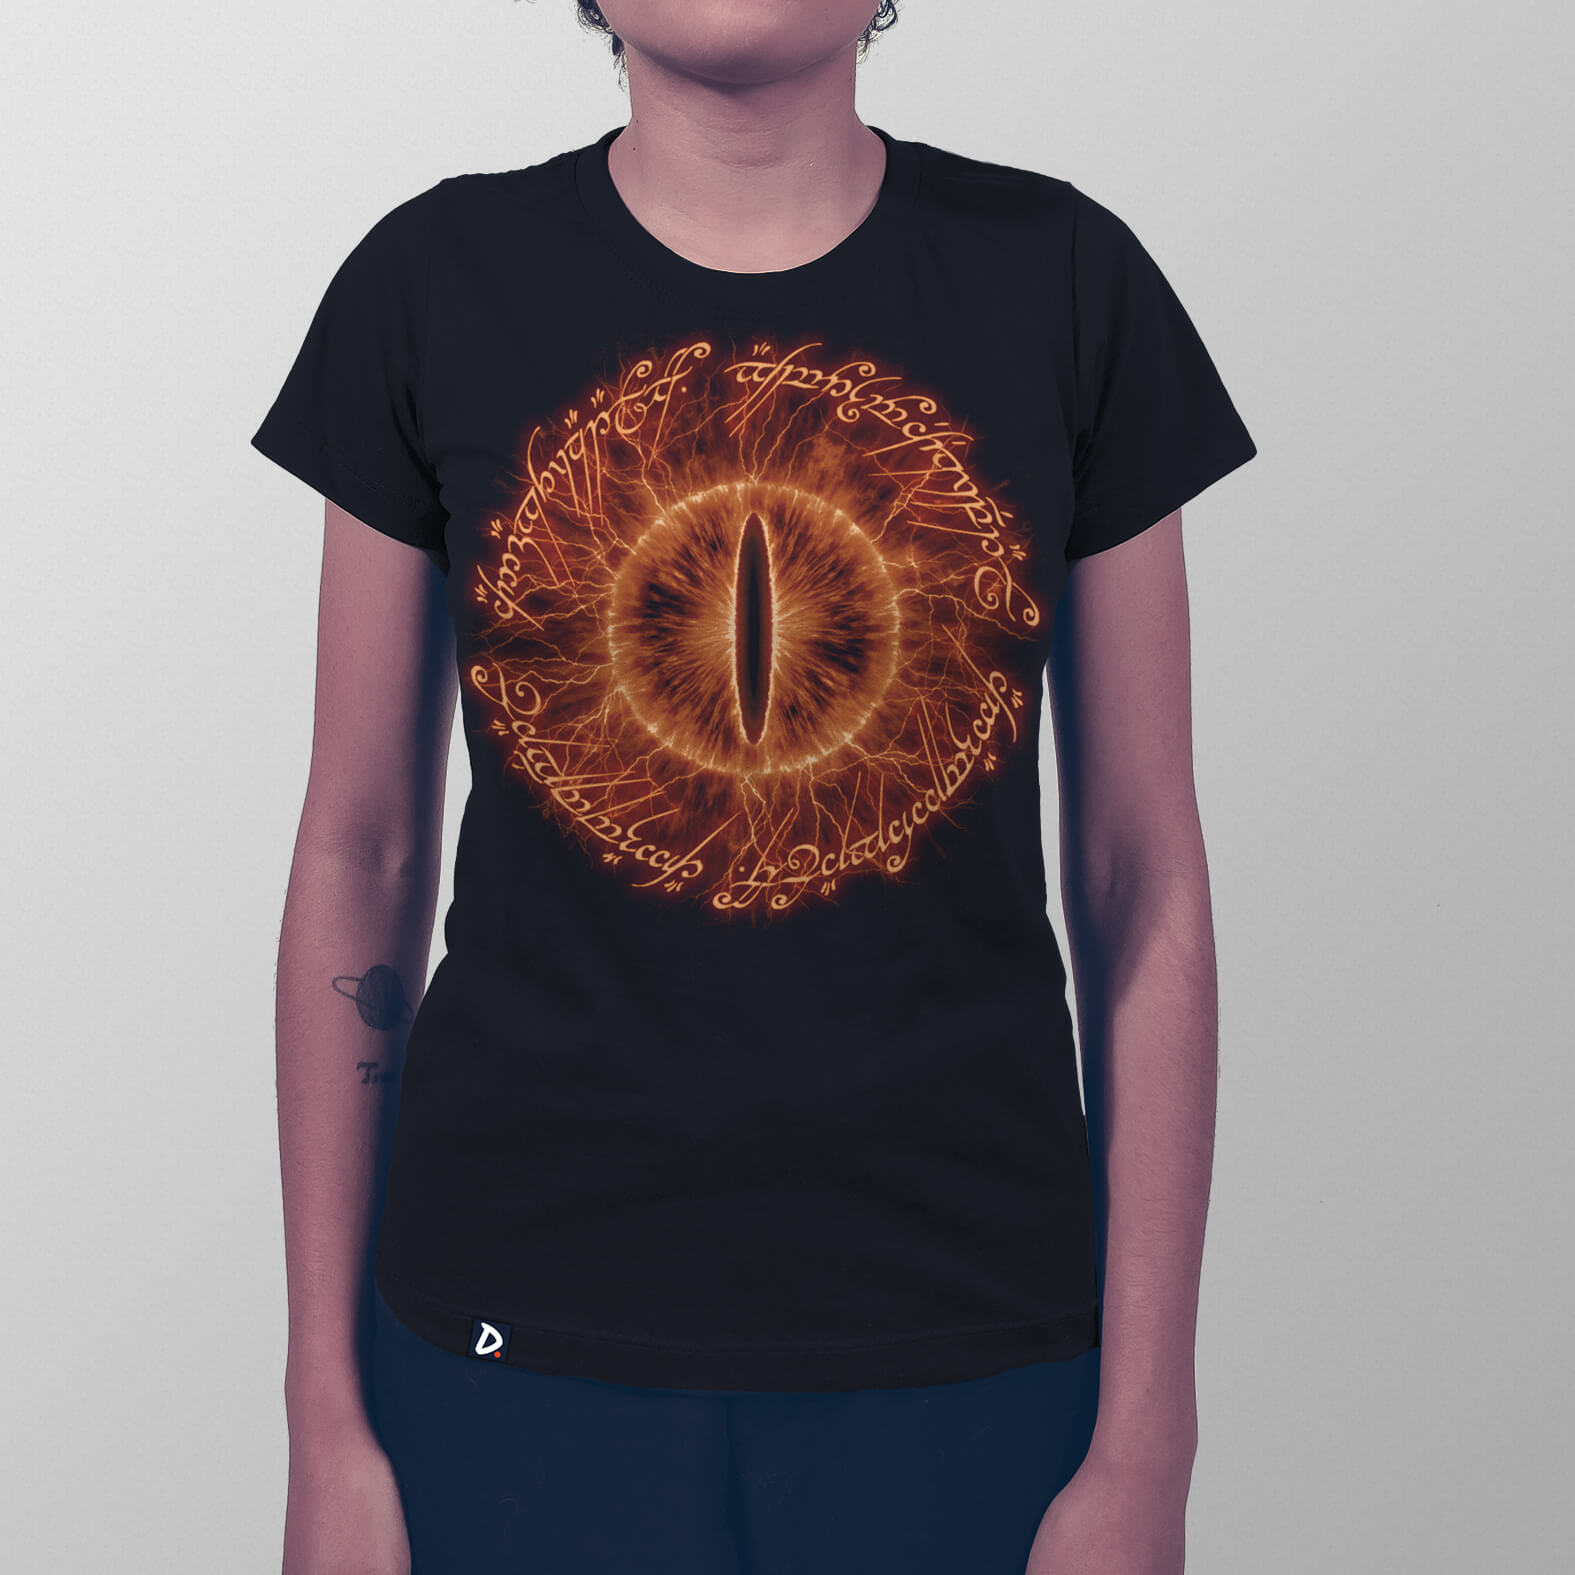 Camiseta Poema do Anel Sauron Edition